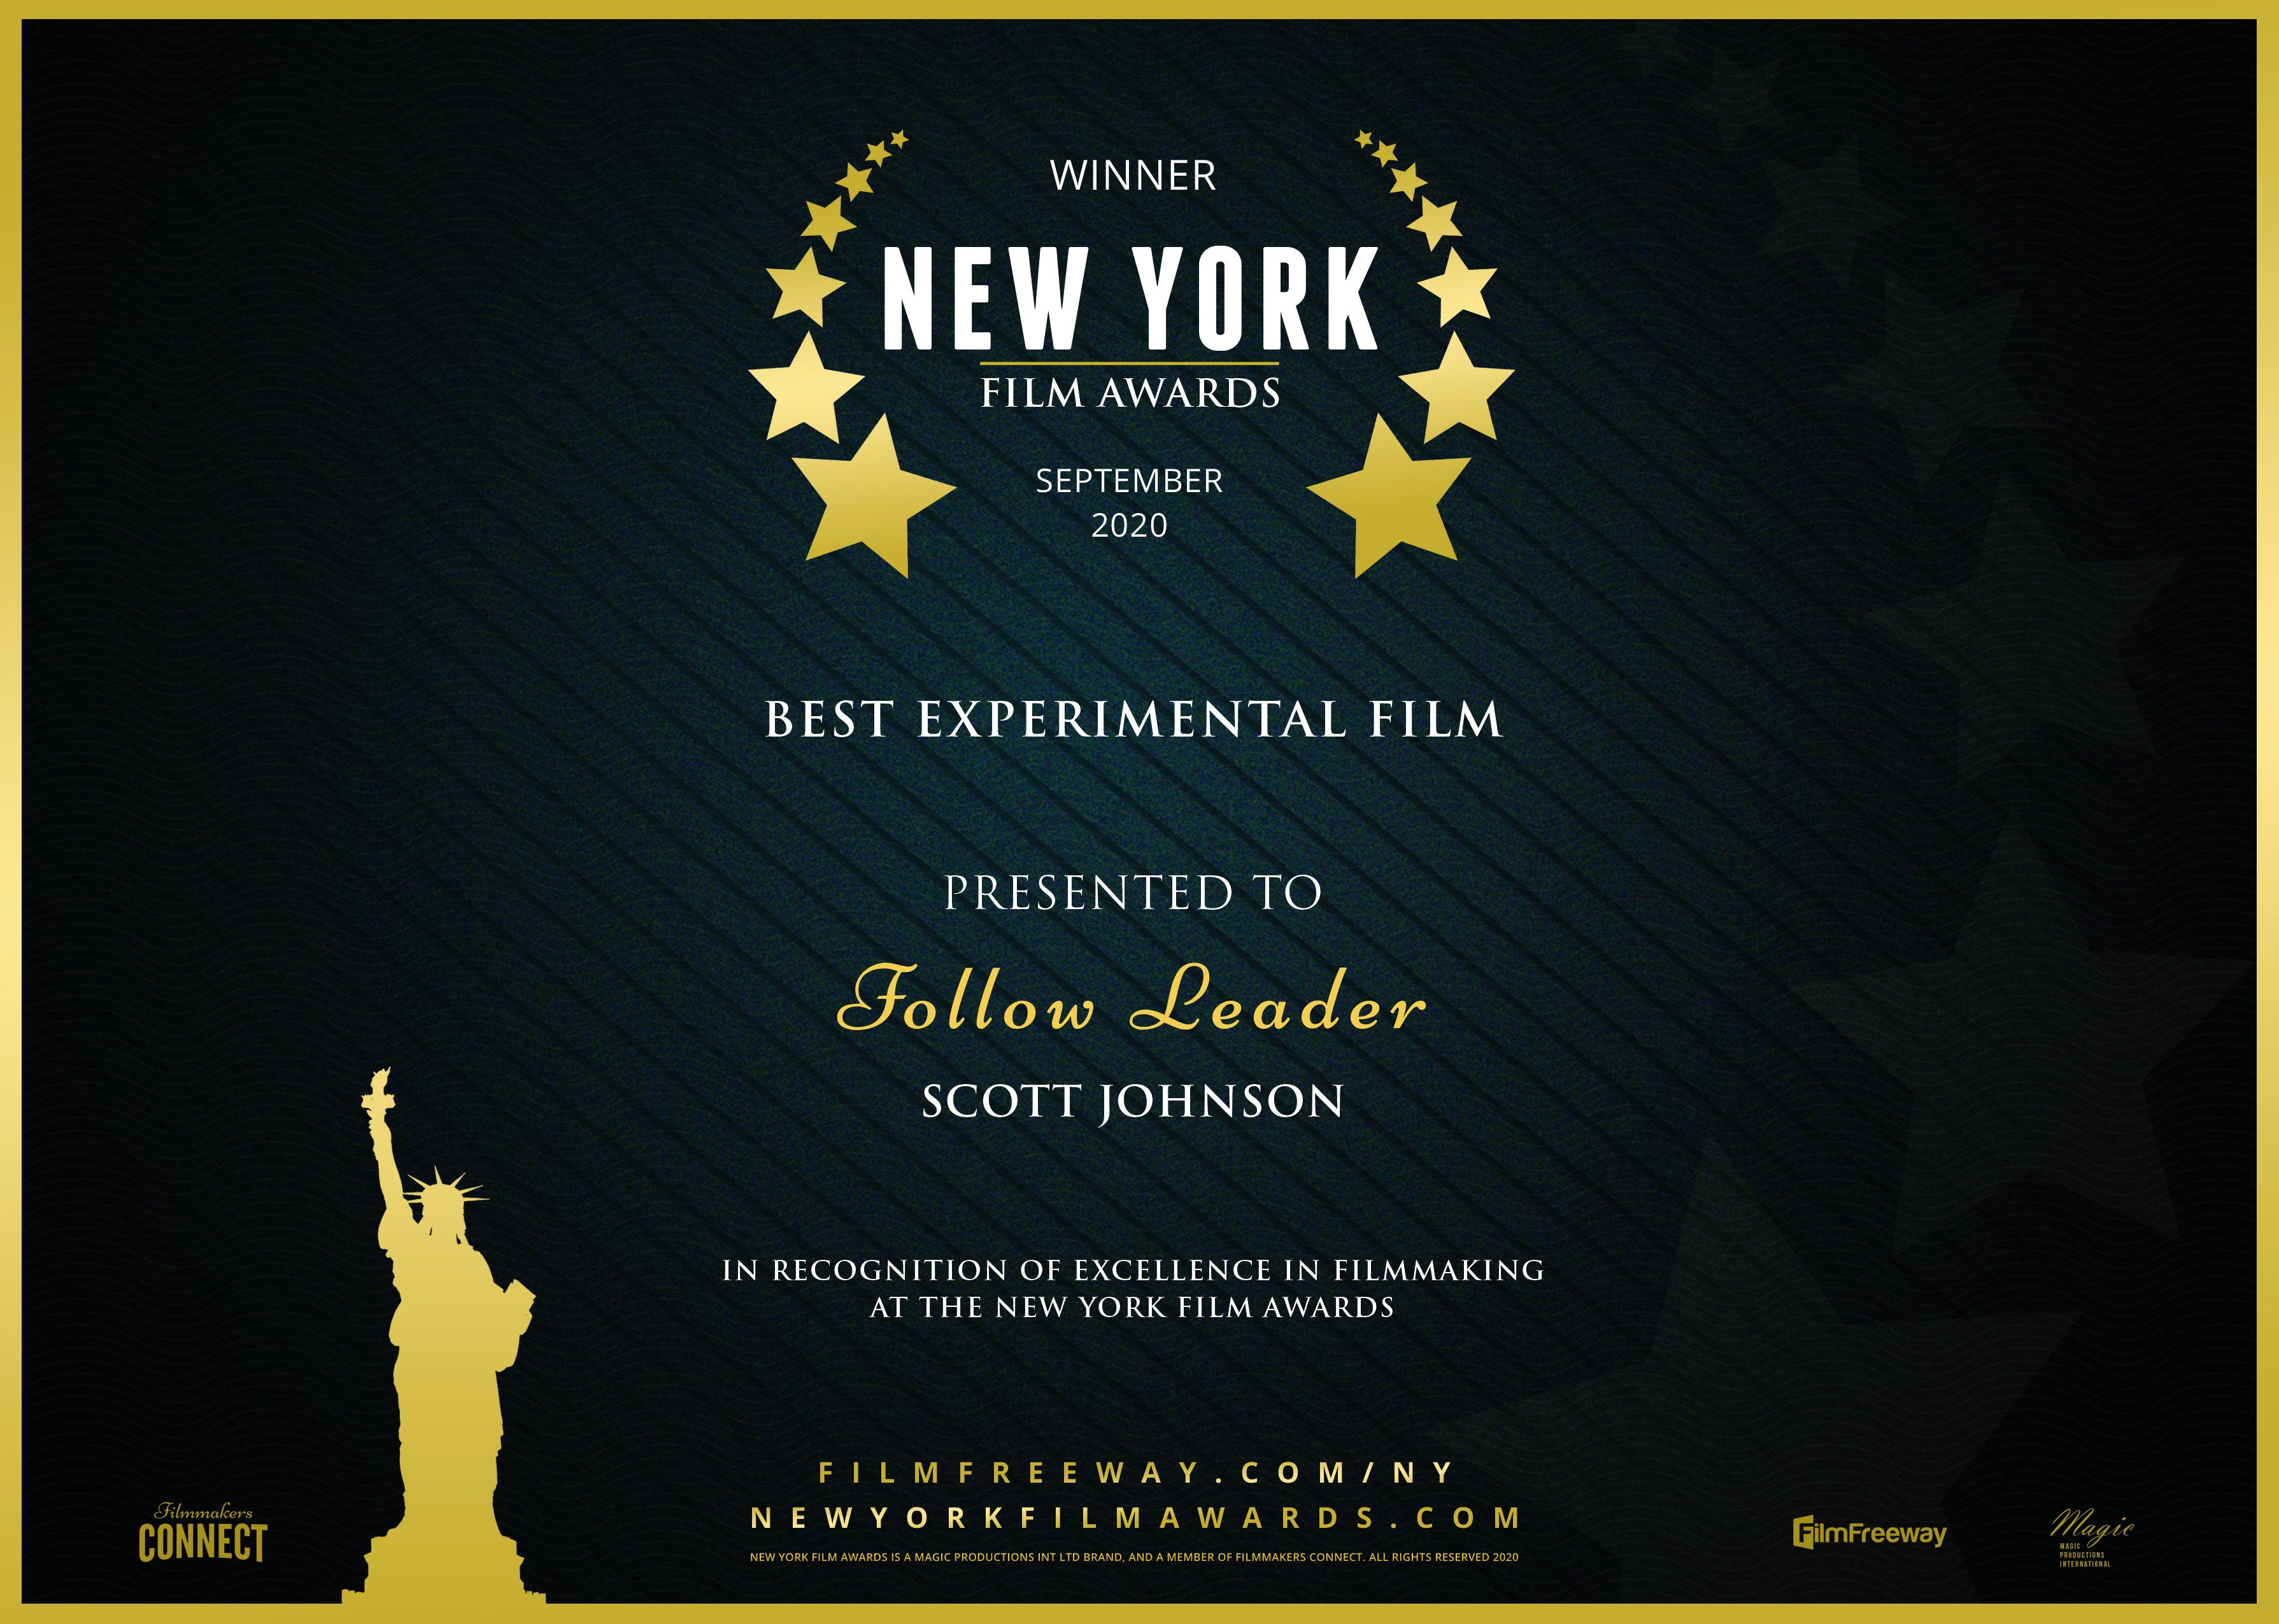 New York Film Awards - Best Experimental Film